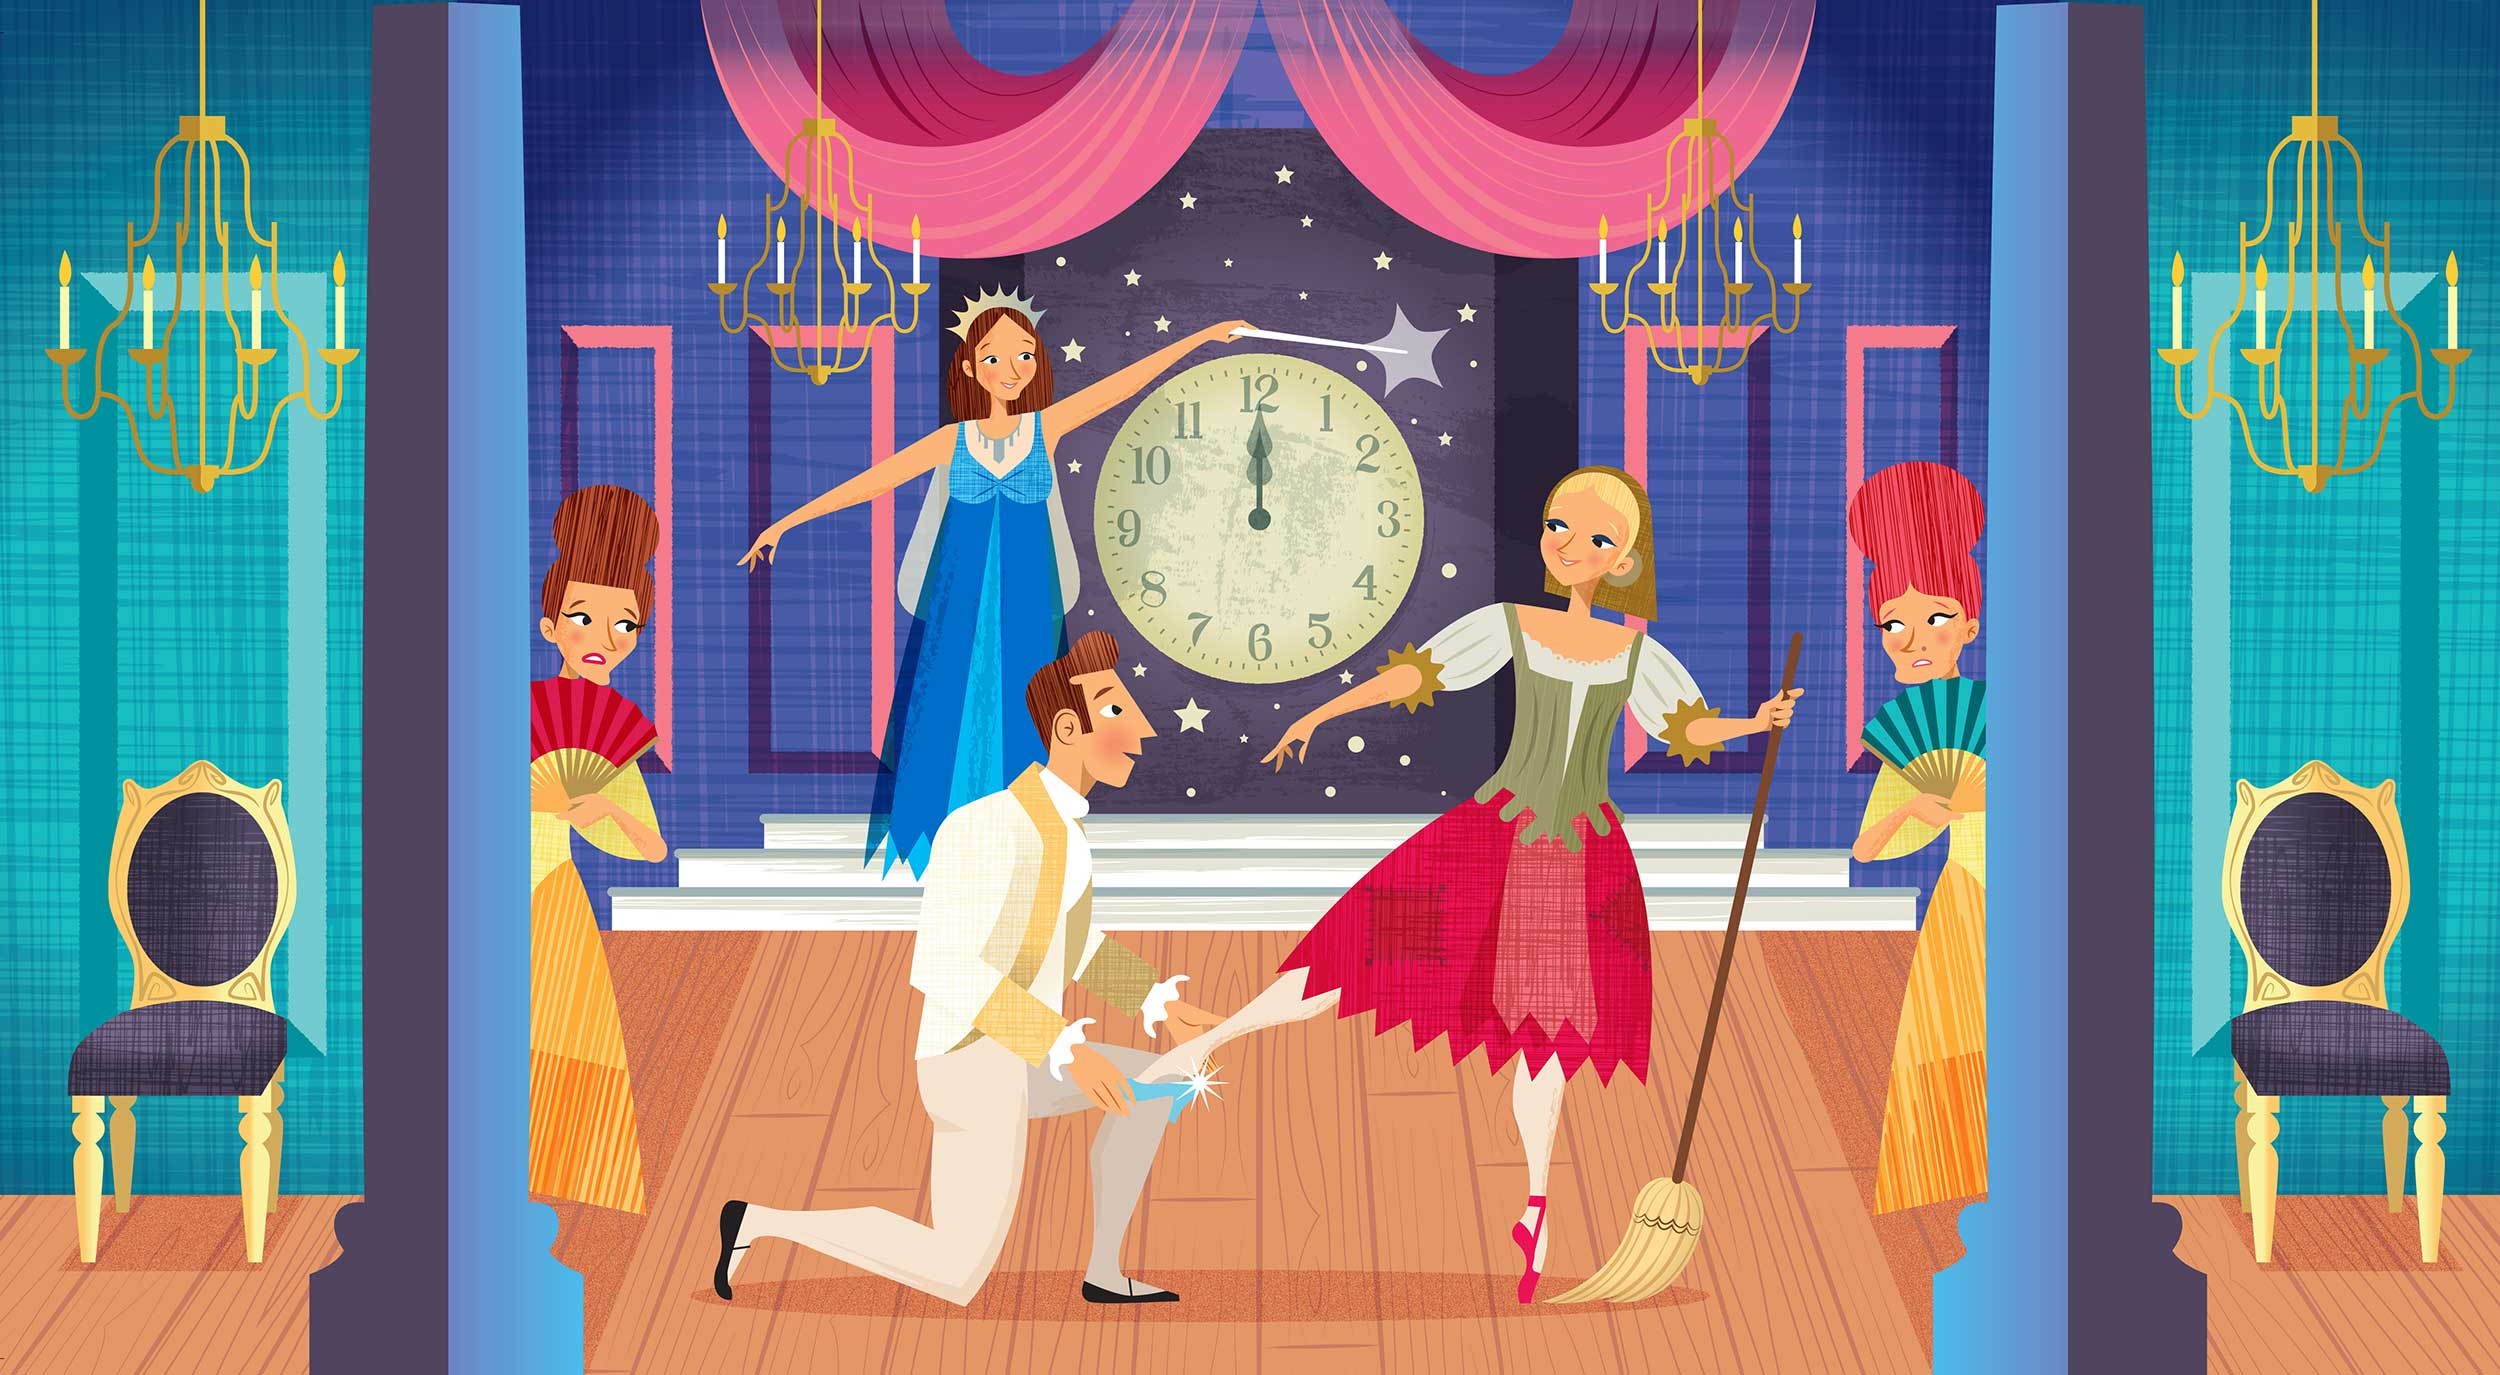 MFB-Cinderella-v4-without-banner_PRESS-USE_Illustration-Mark-Ruffle